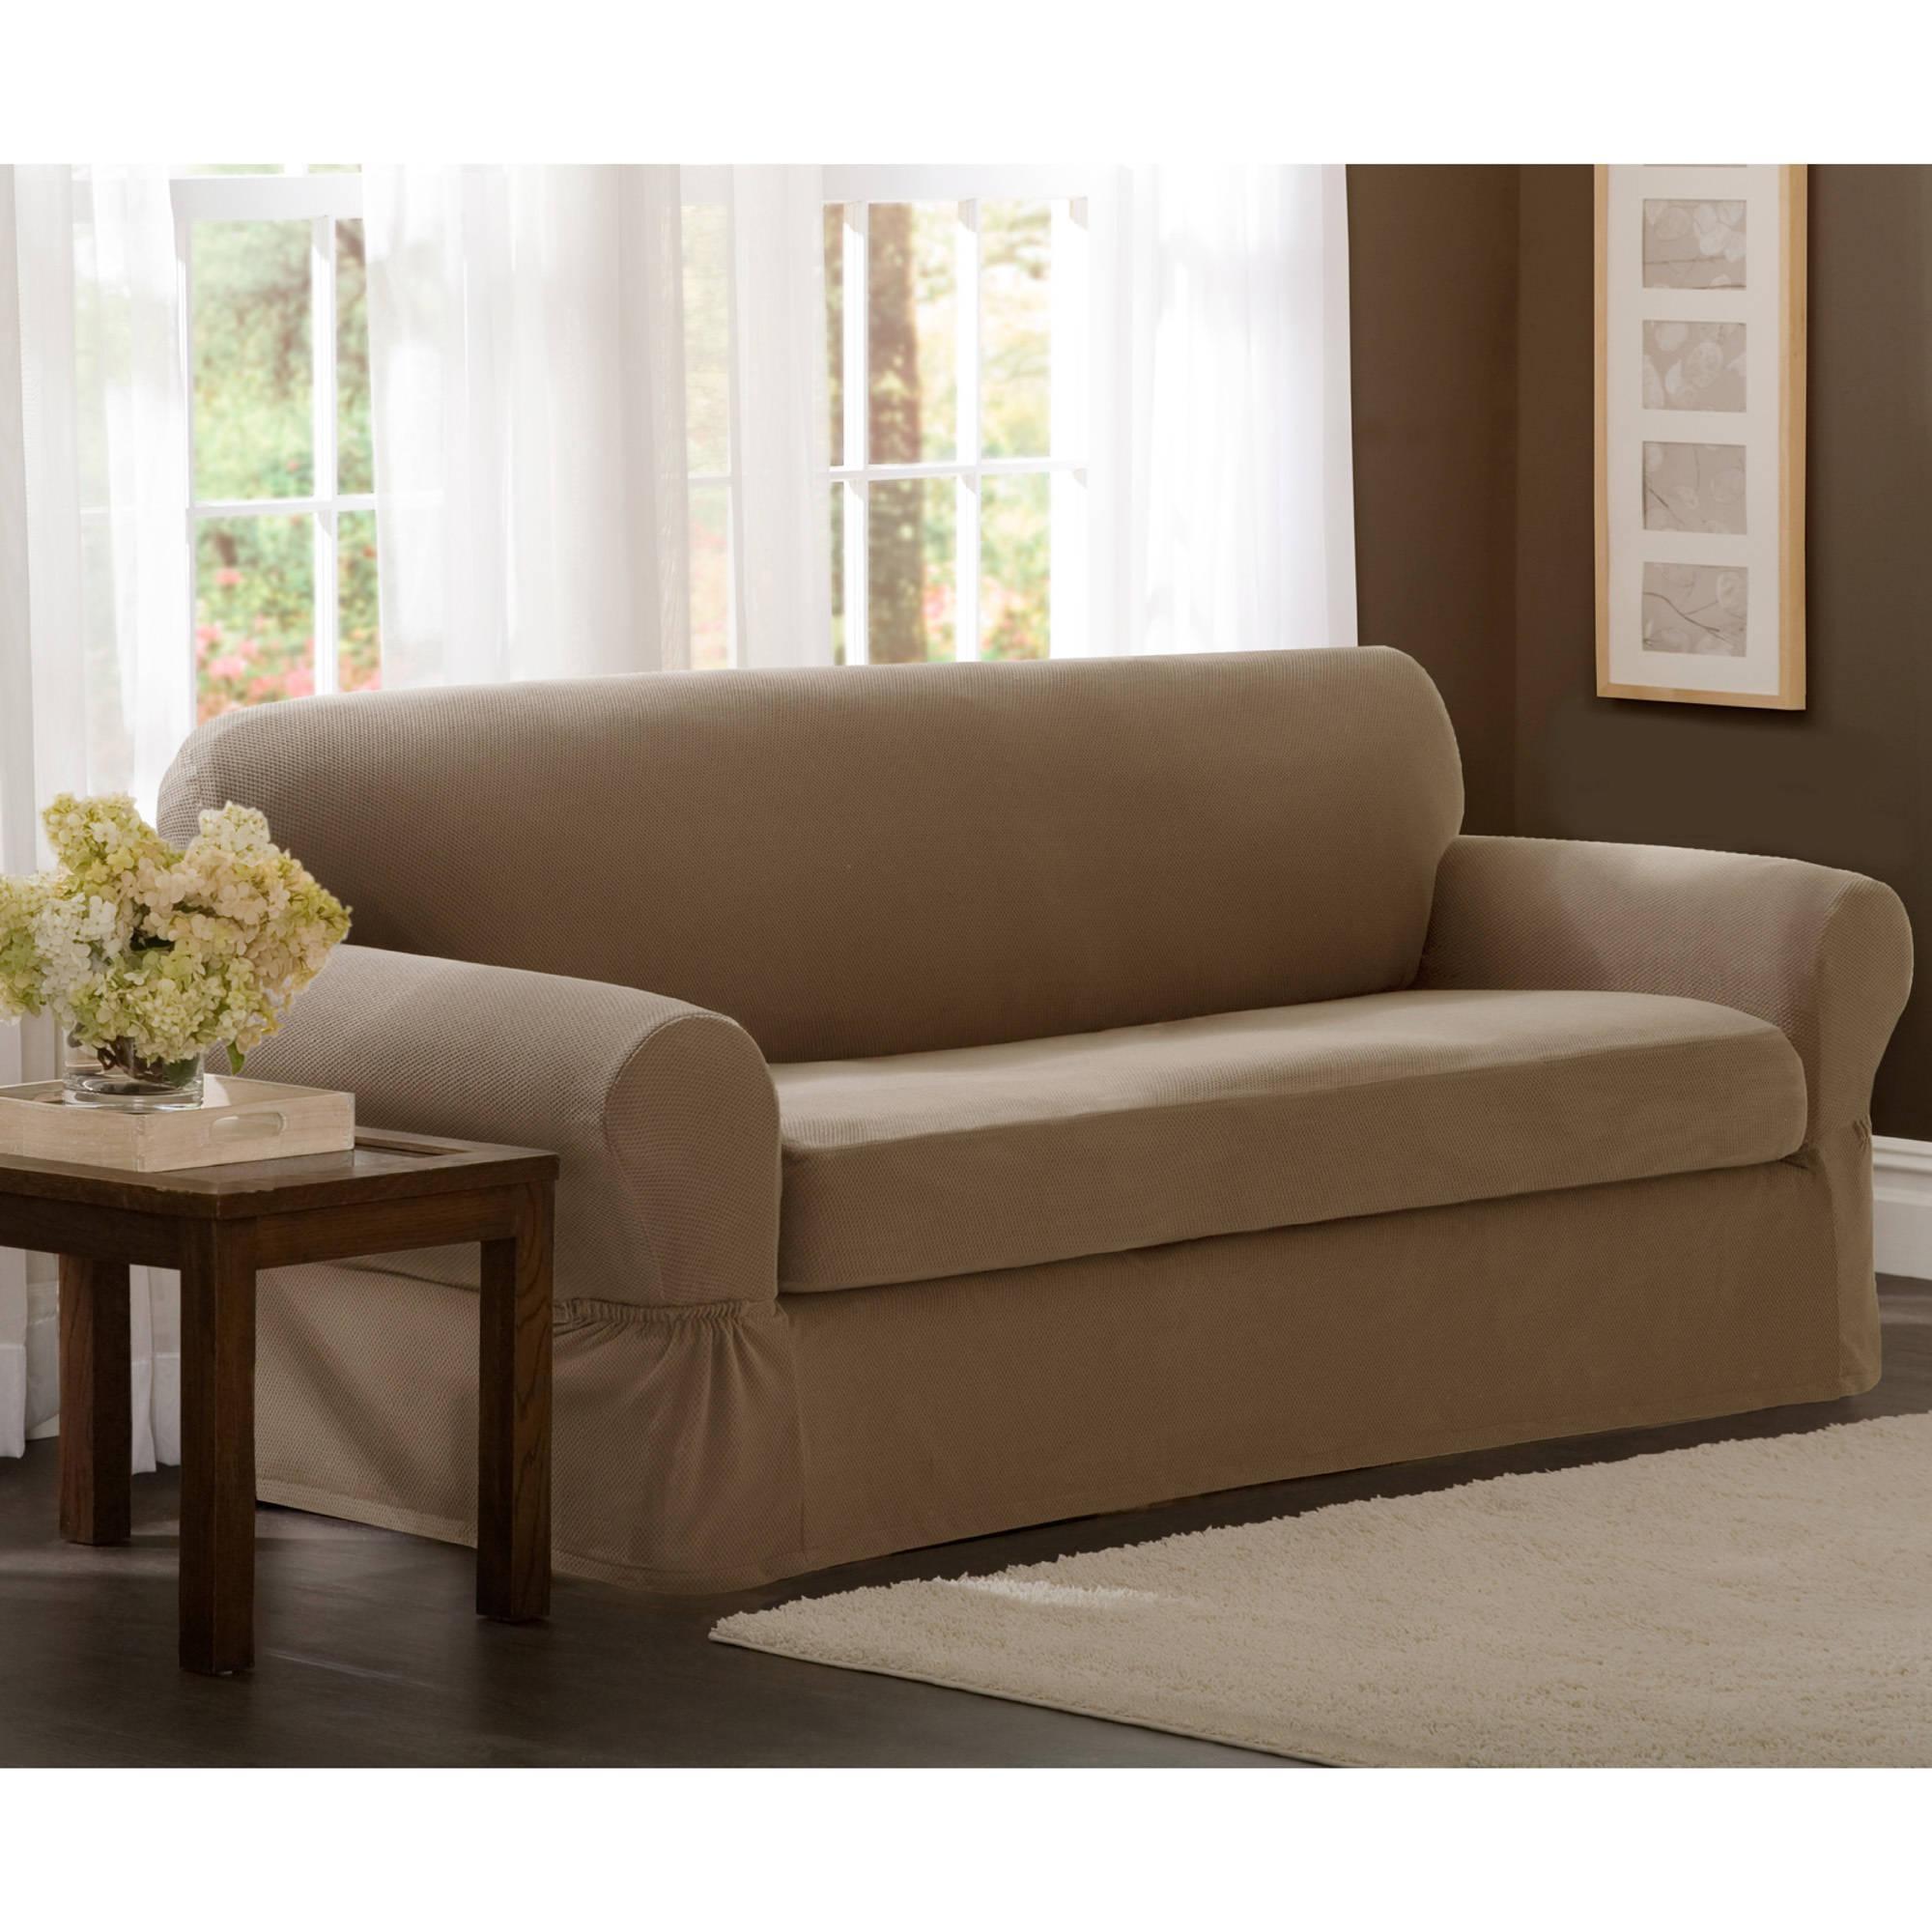 7 piece sofa covers light blue throws 20 top stretch slipcovers for sofas ideas